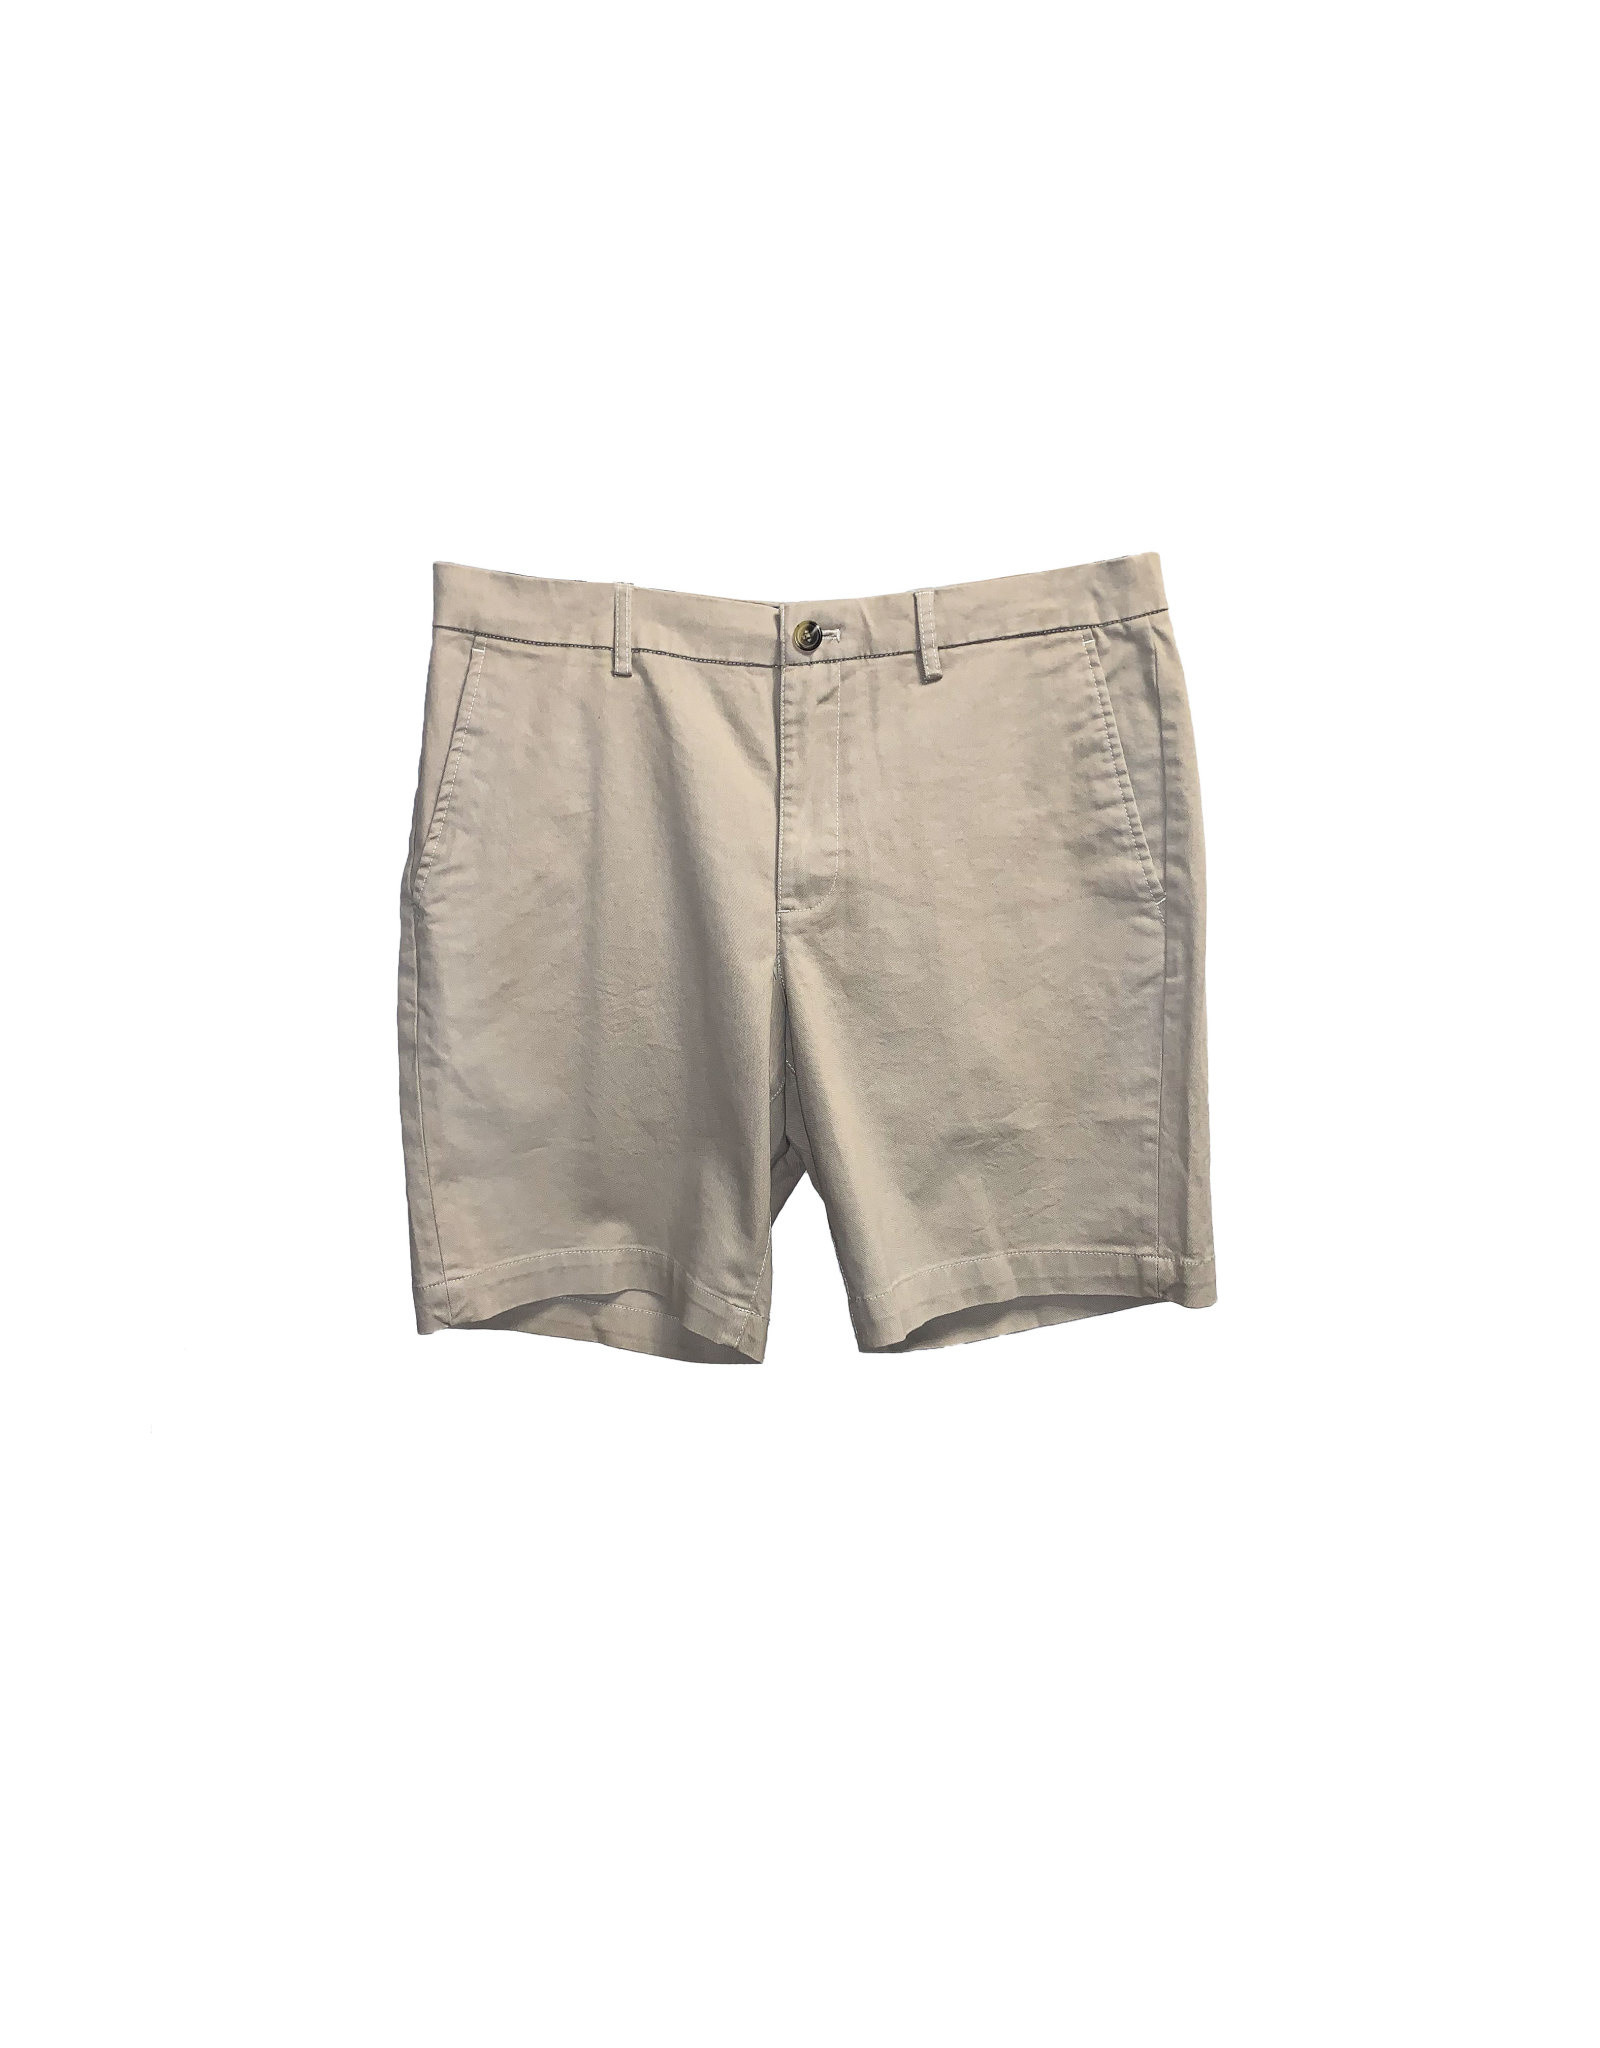 CHAPS CHAPS  Men's  Shorts   Flat Front  Stretch Size W33